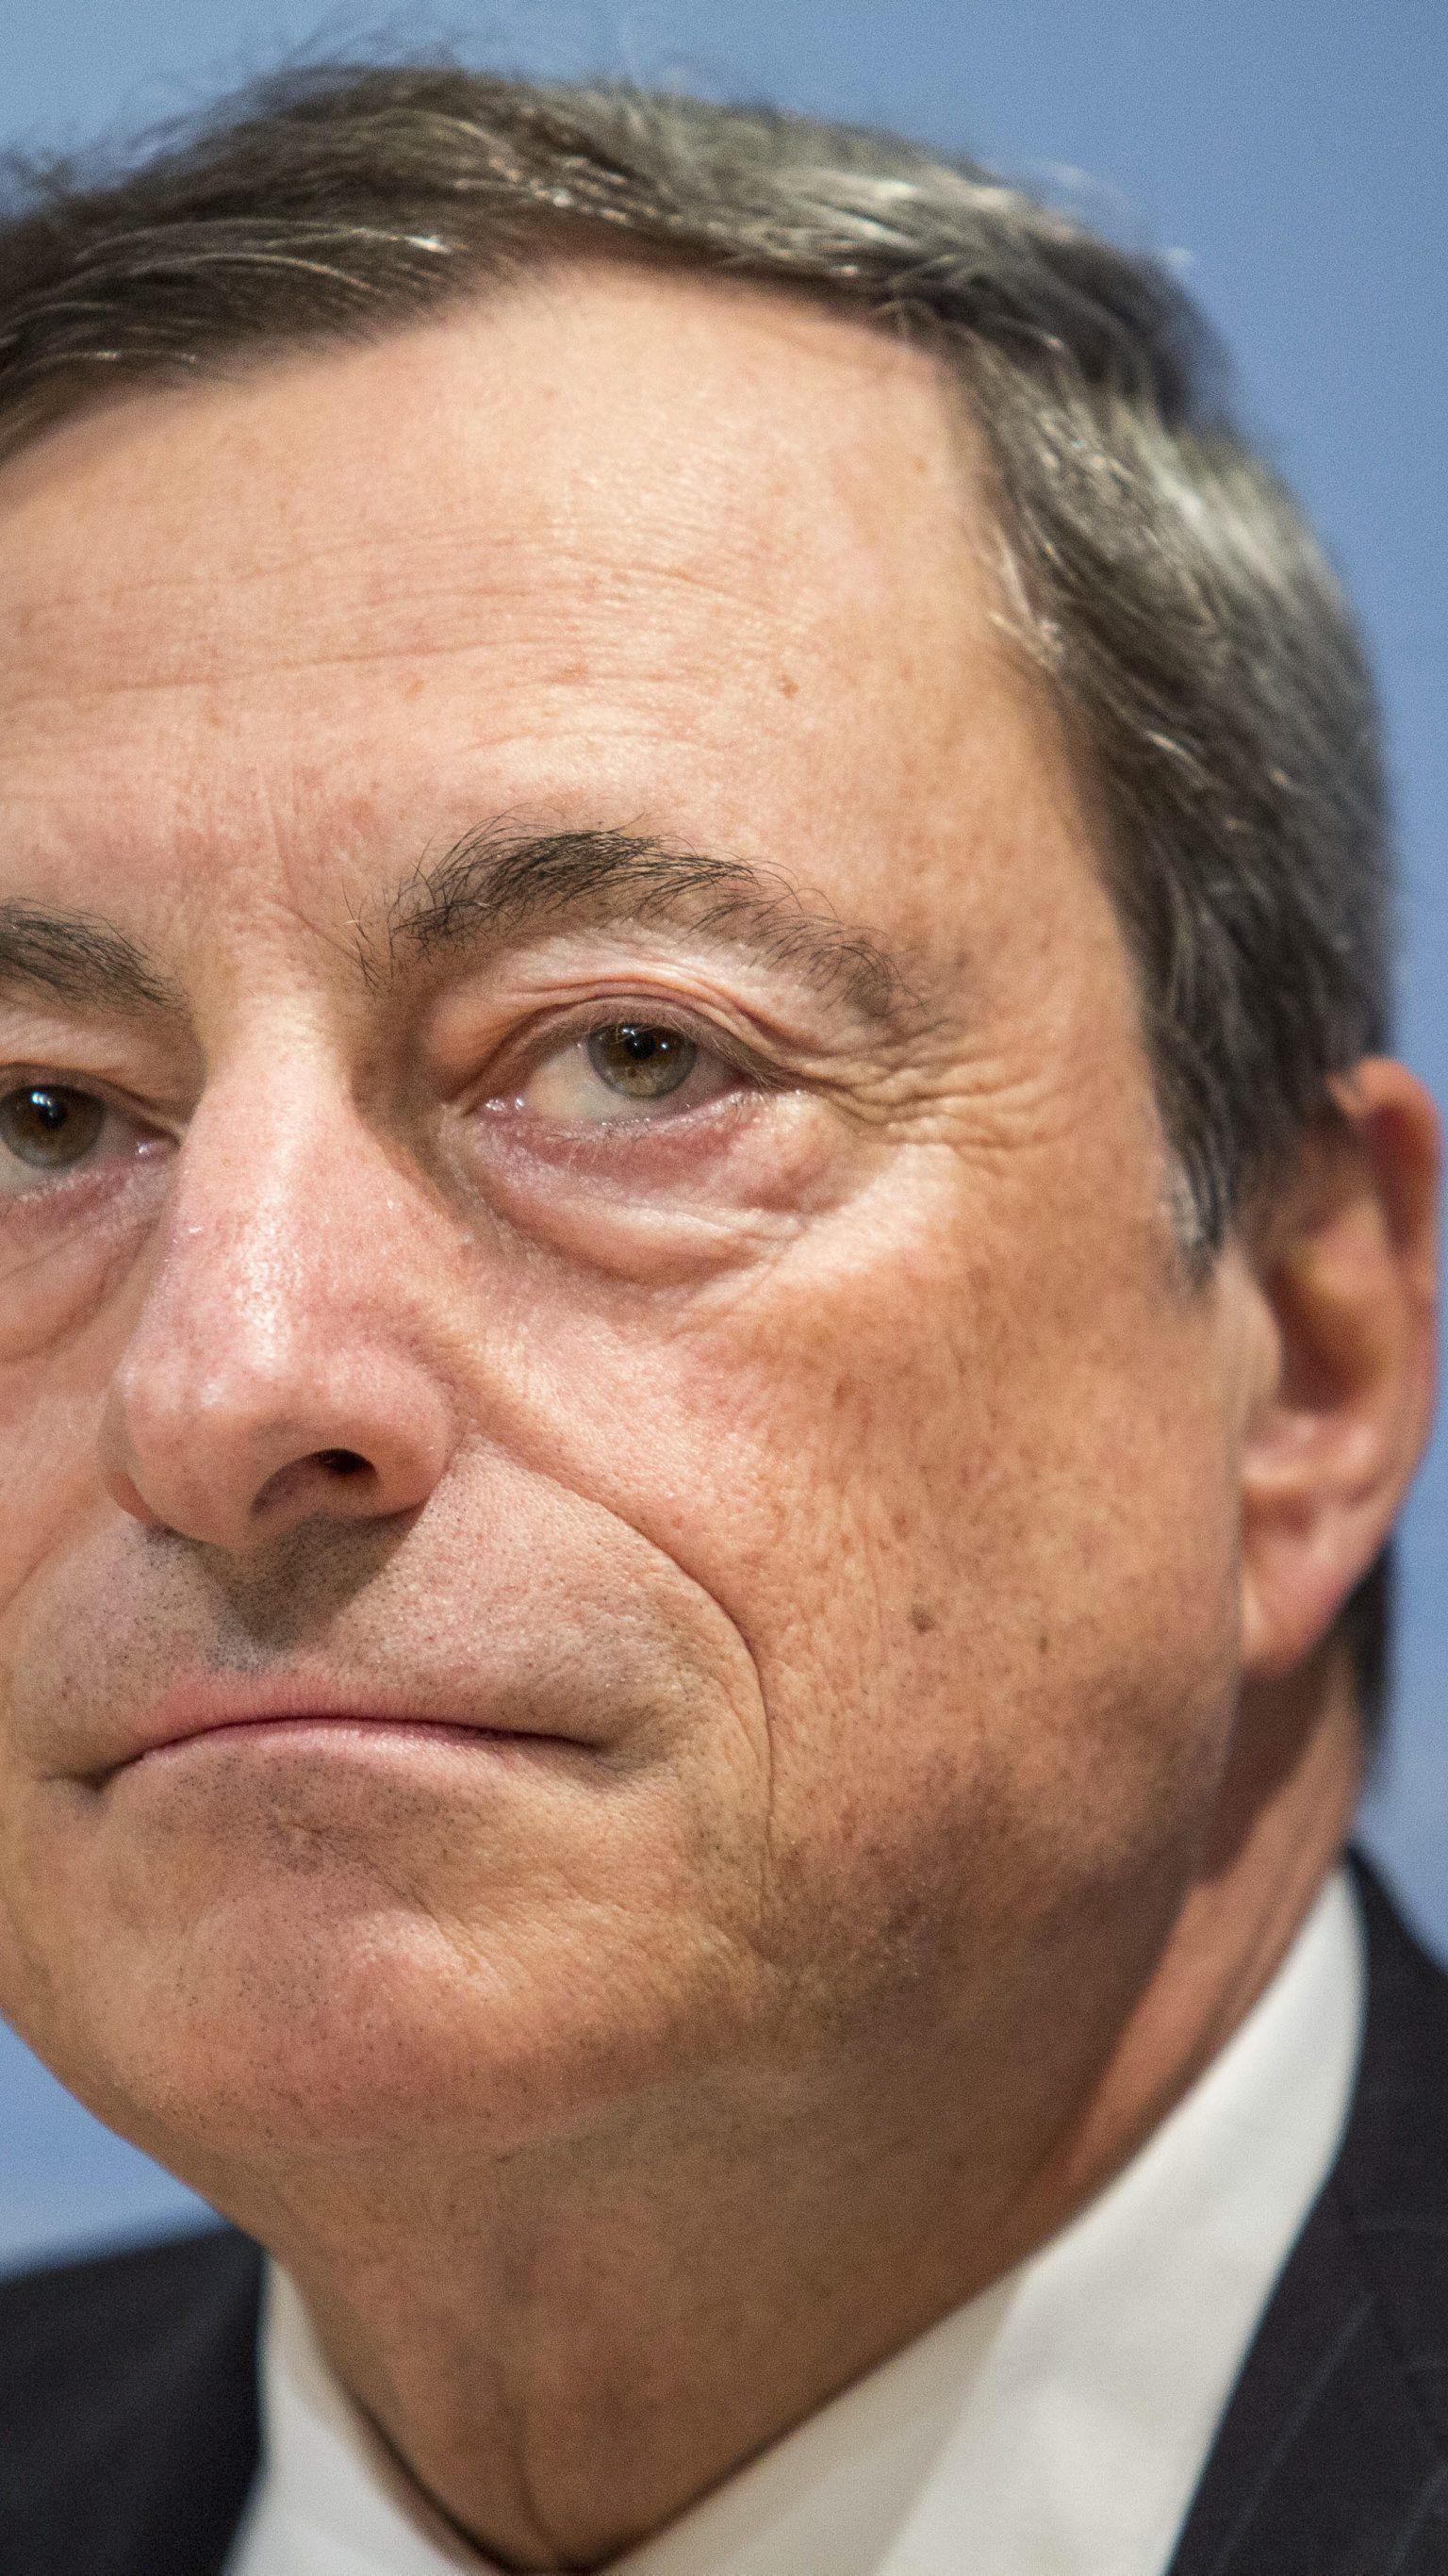 Sorgenvolle Miene bei EZB-Präsident Mario Draghi.